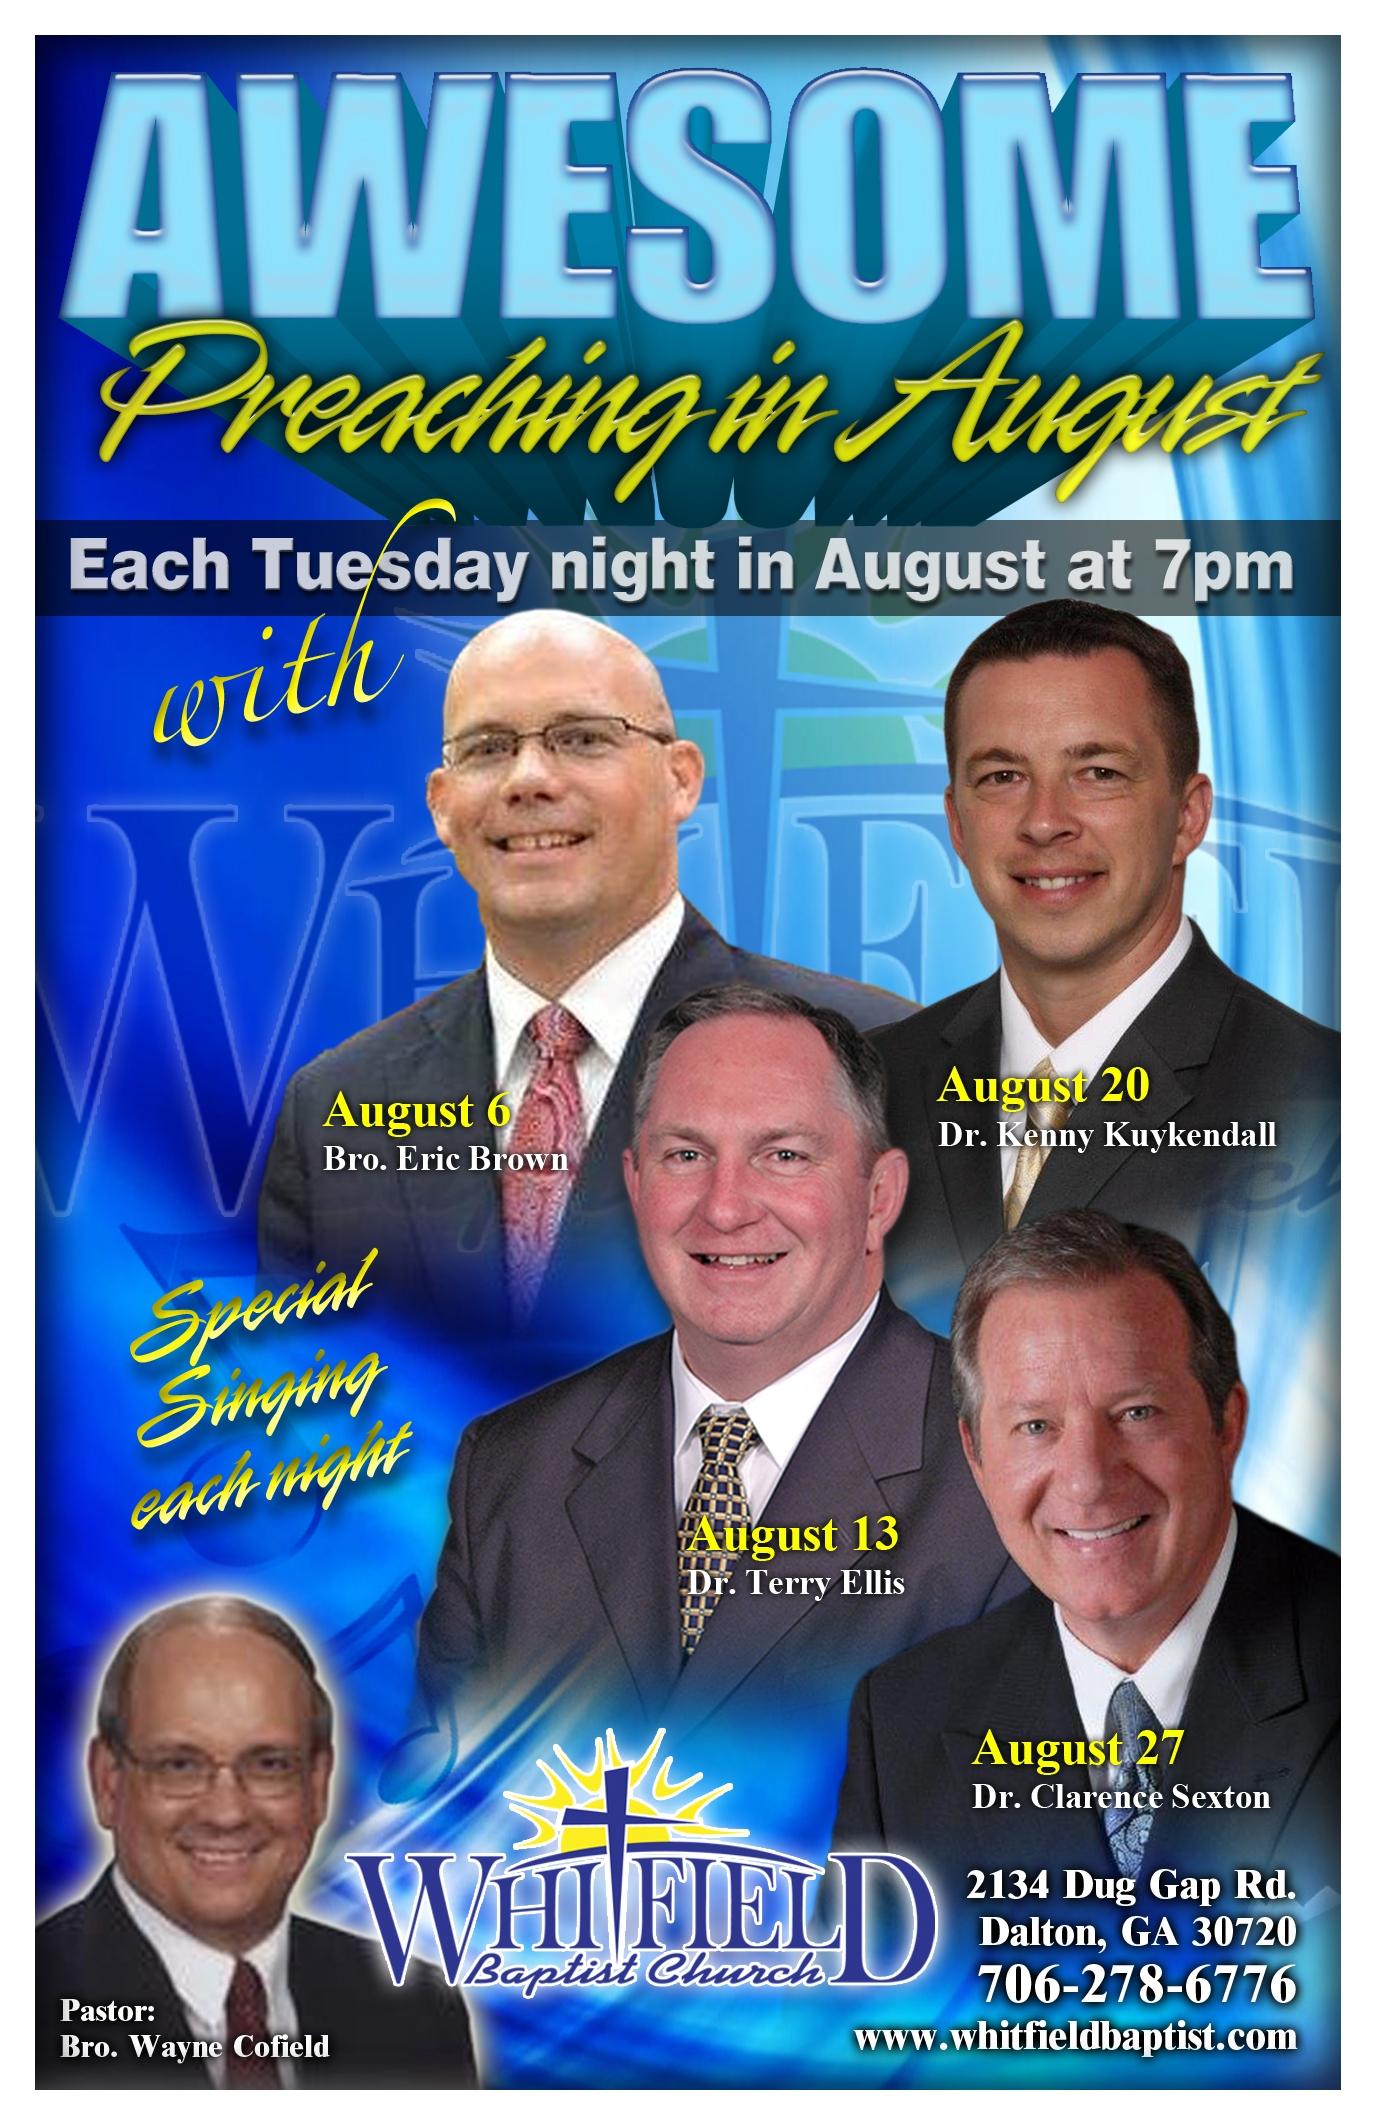 awsome-preaching-2013-2.jpg